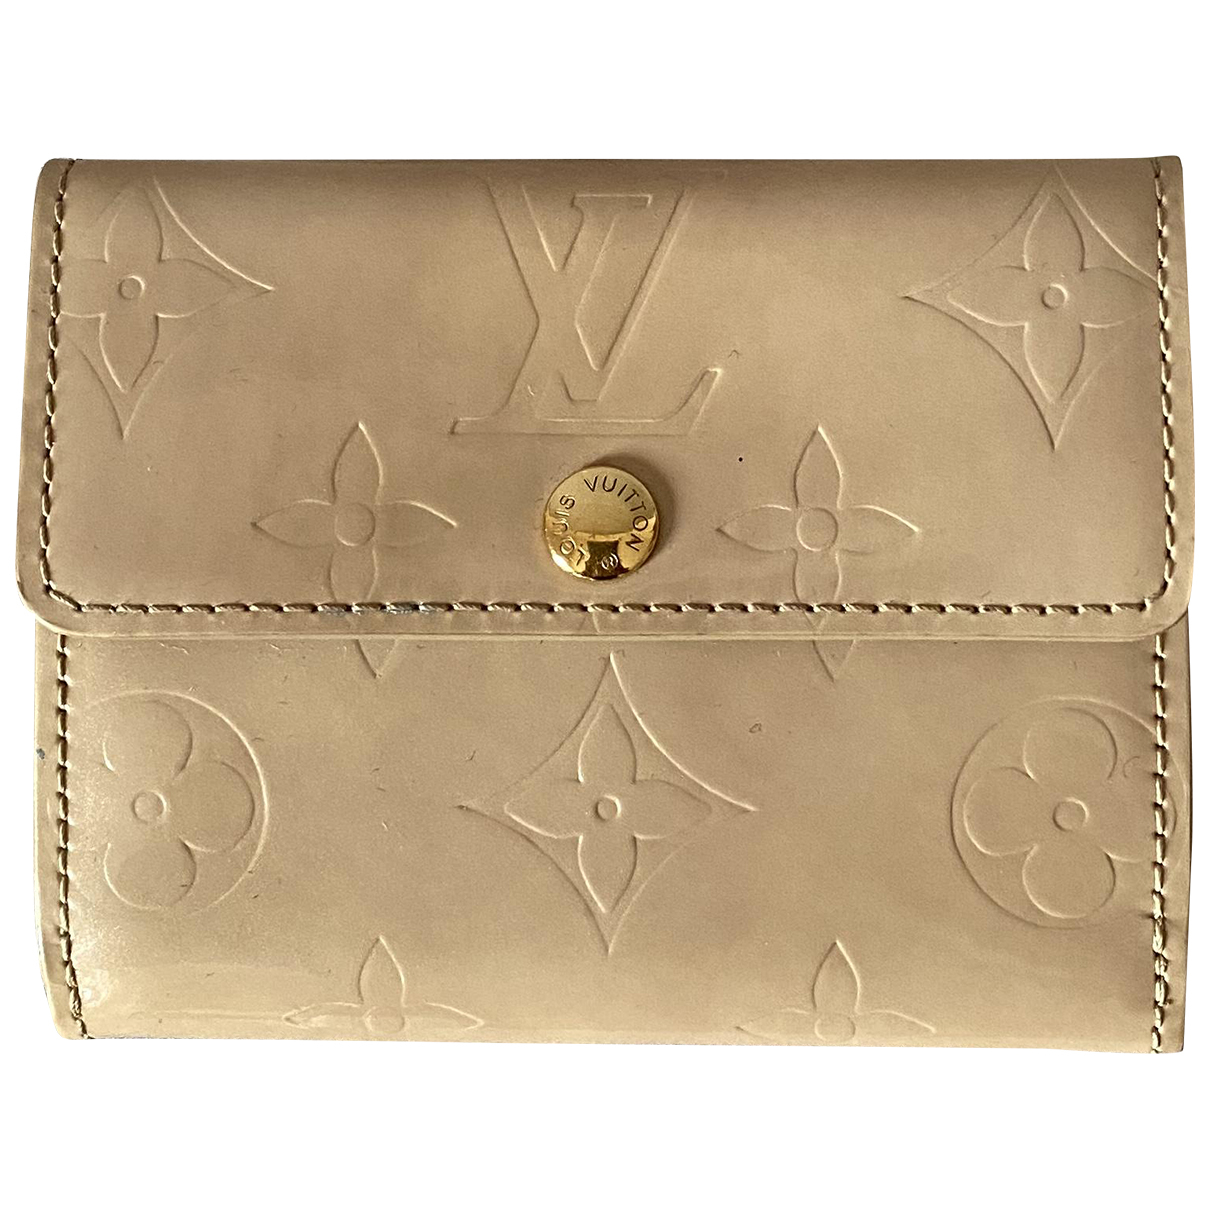 Louis Vuitton \N Portemonnaie in  Beige Leder